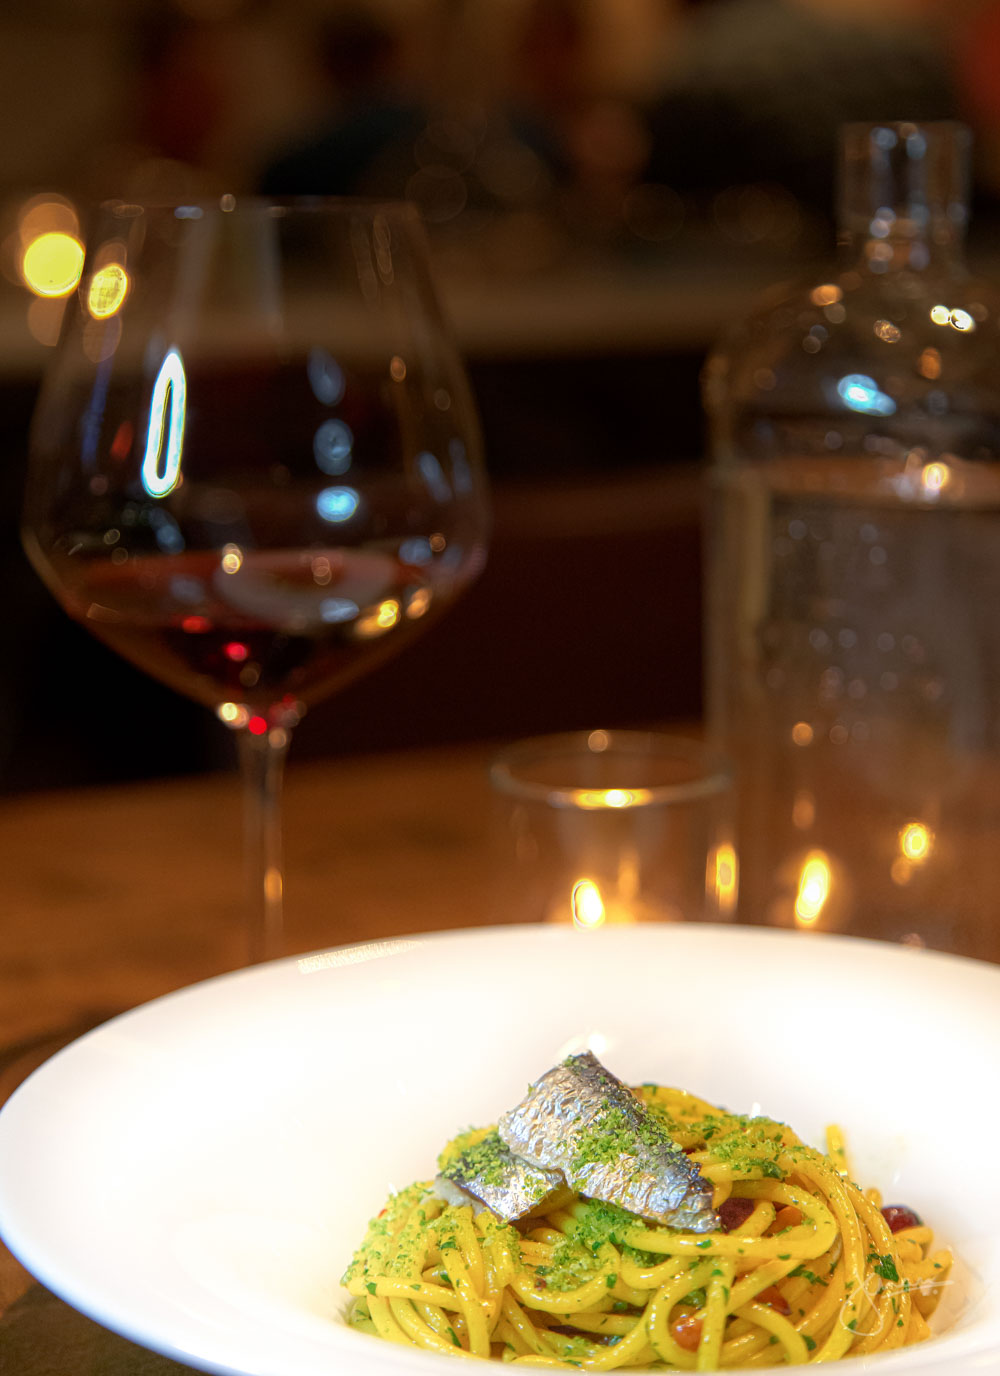 Sicily | Spaghetti, Sardines, Currents, Pine Nuts, Saffron Wine Pairing: Massei Zisola Nero d'Avola